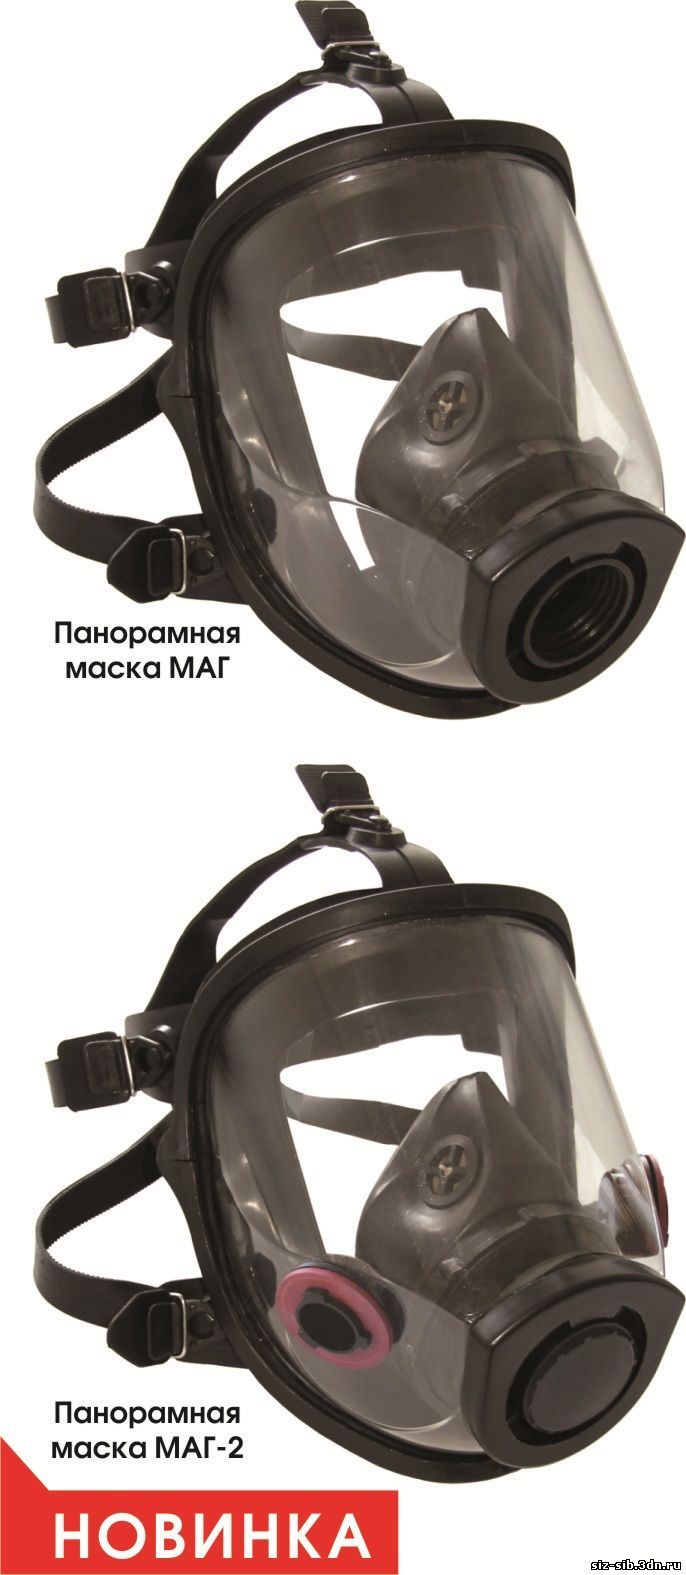 Что такое маска панорамная